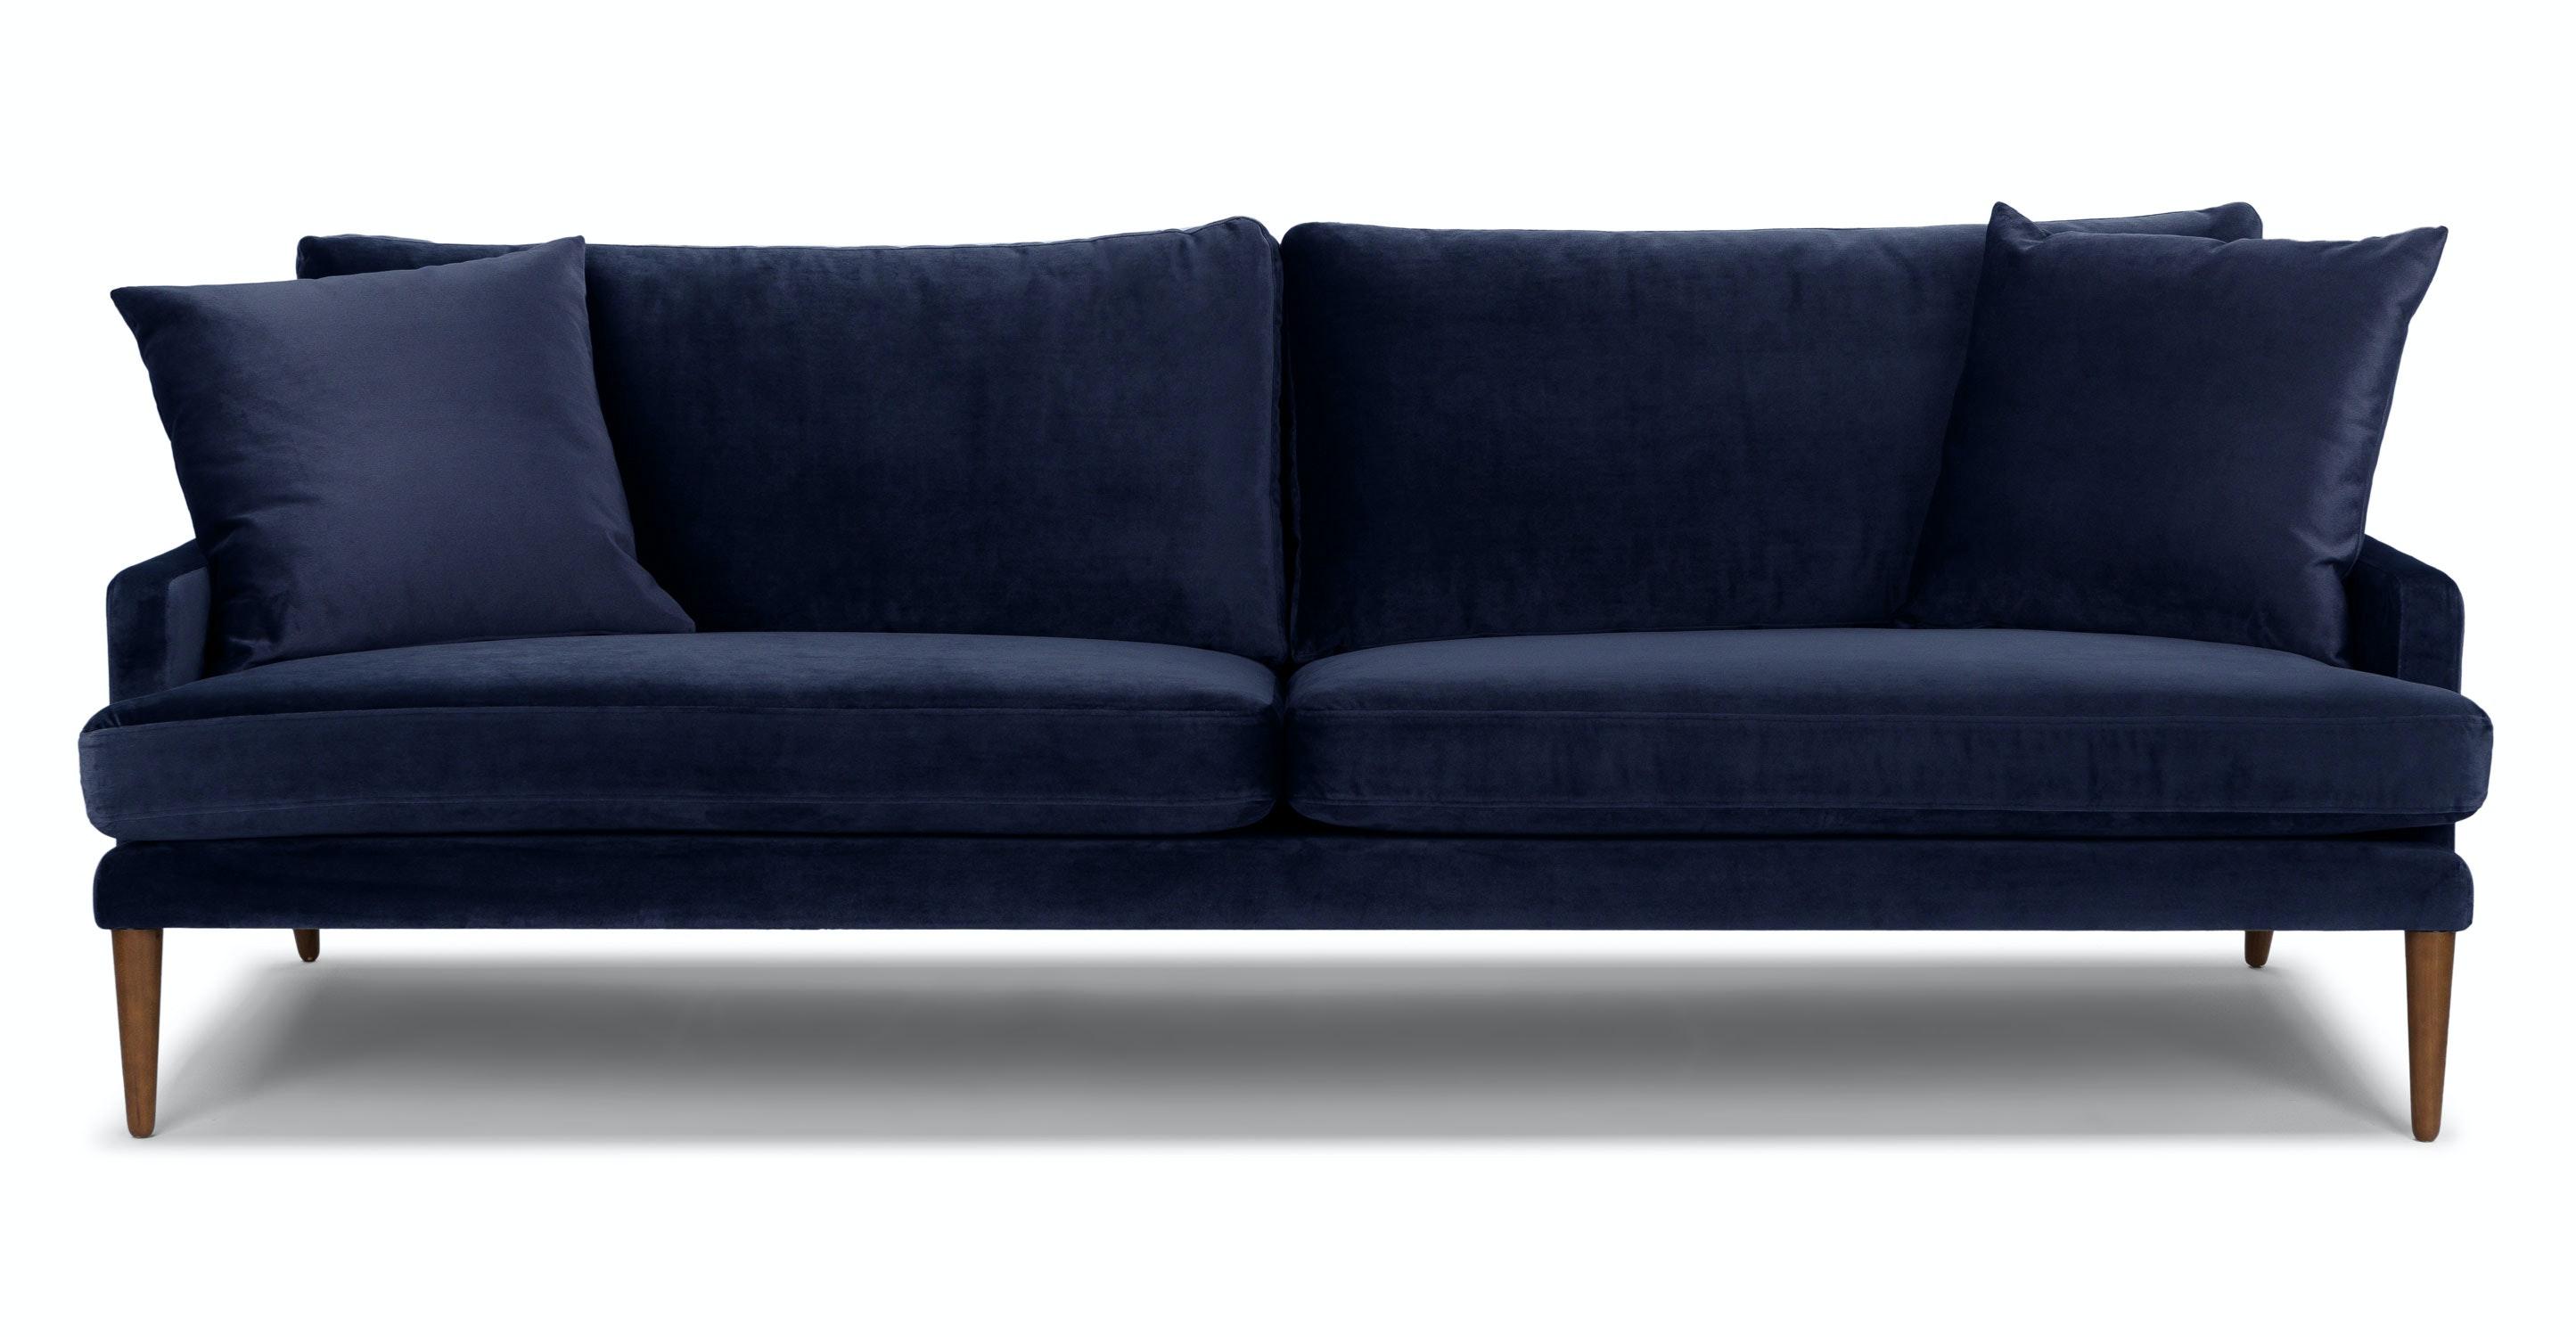 Blue Velvet Sofa, 3 Seater, Solid Wood Legs   Article Luxu Modern Furniture